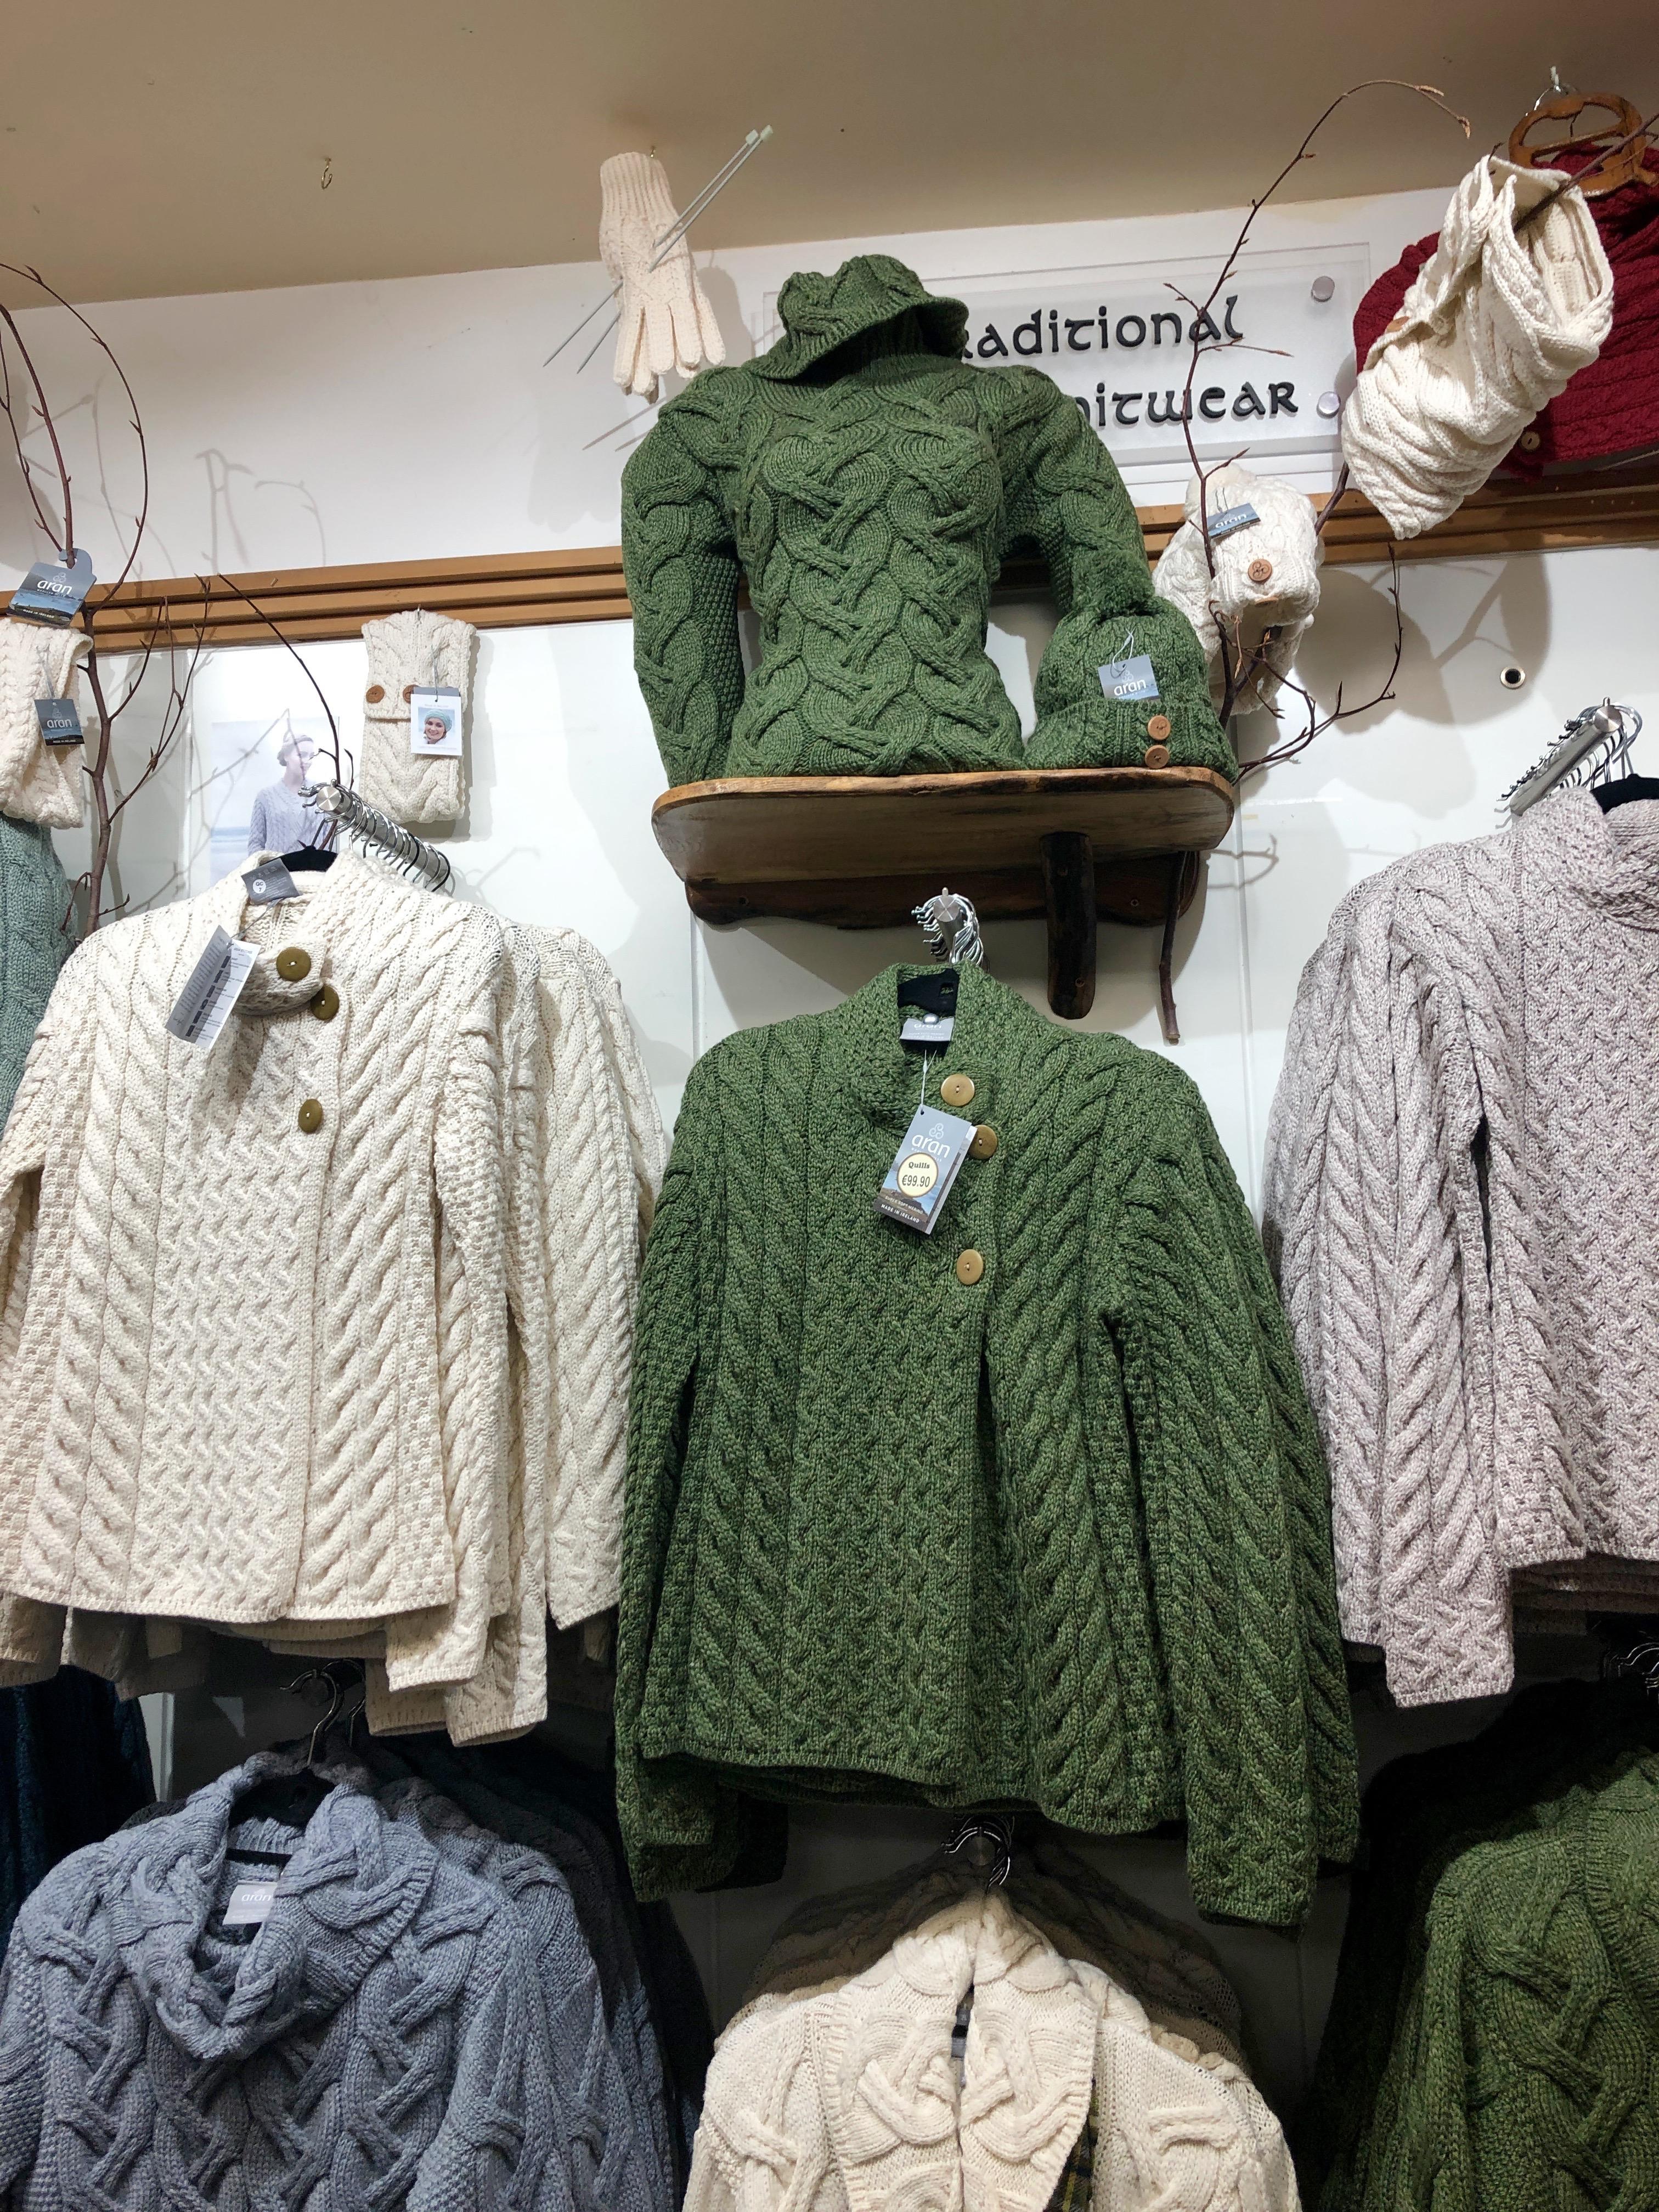 Aran Wool Sweaters: Traditional Irish Knitwear